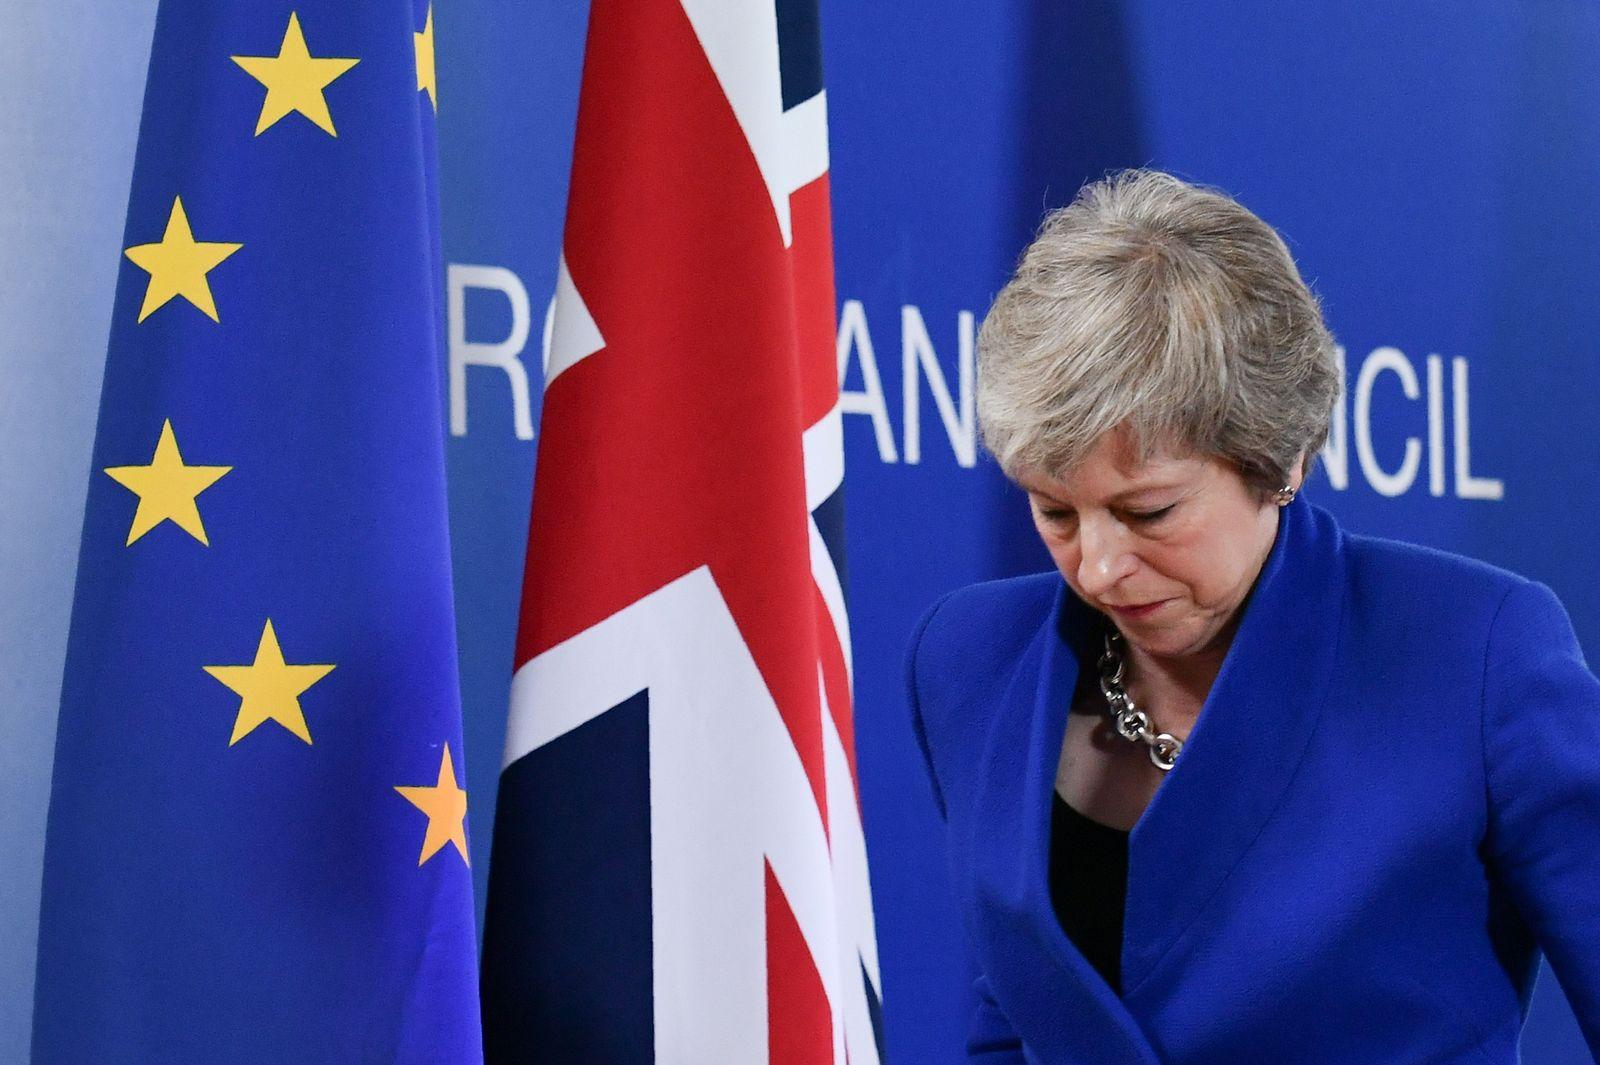 EU-Gipfel / May